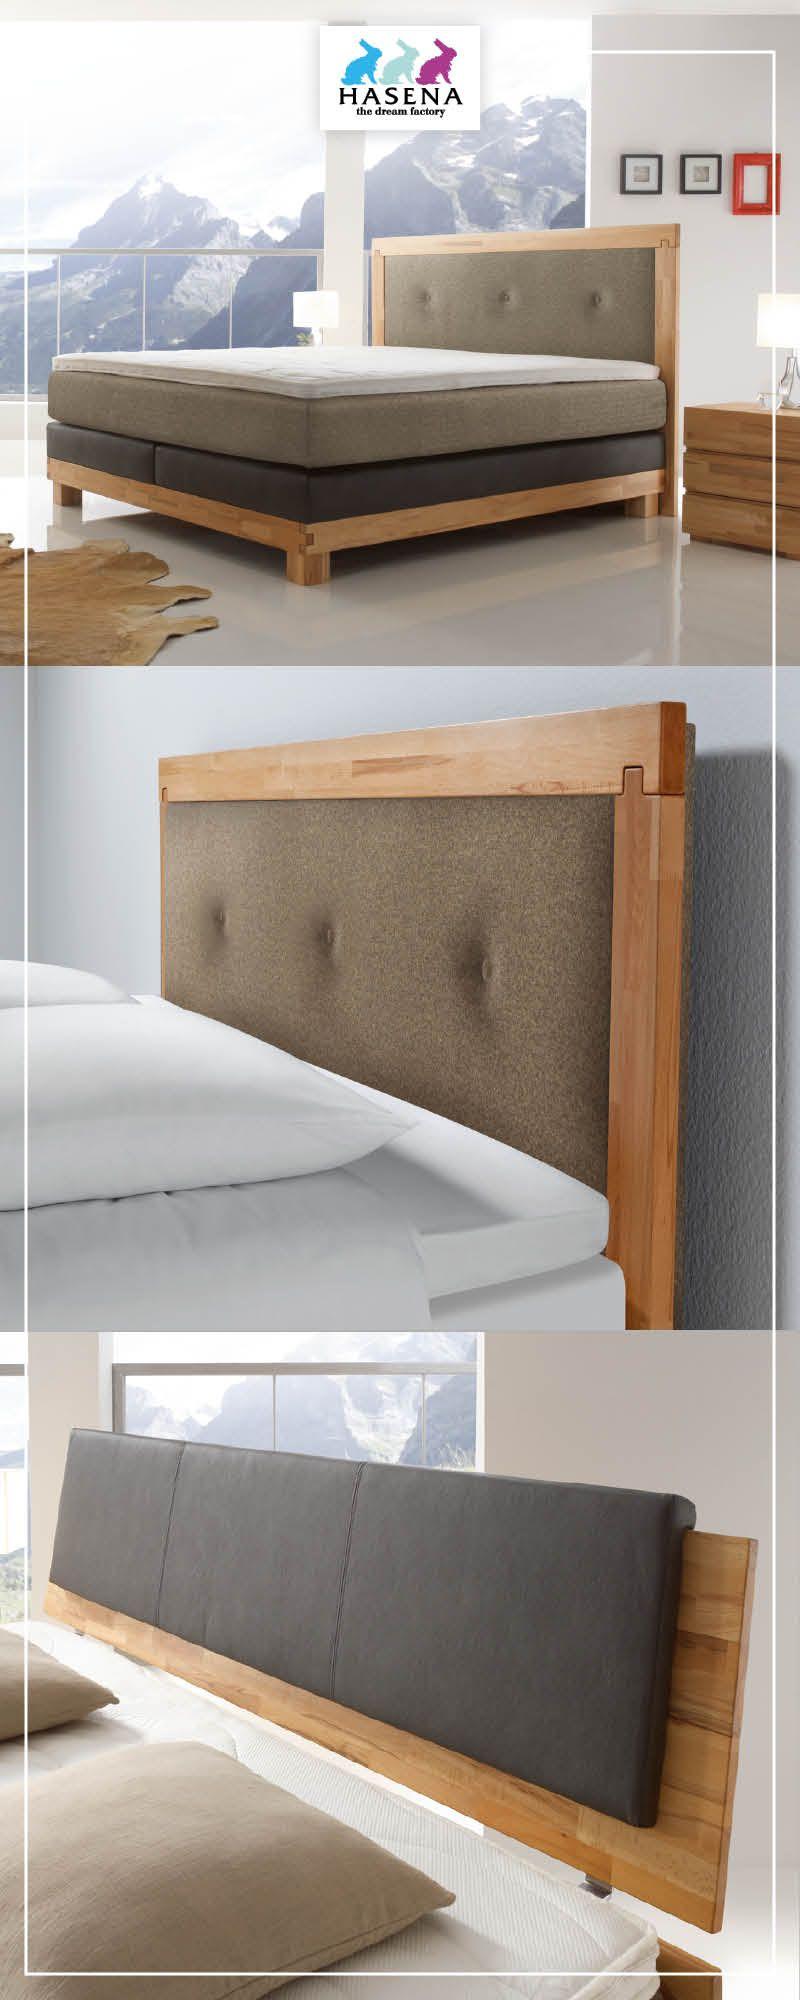 Hasena Boxspring Bett Massiva Mit Kopfteil Merano Oder Kopfteil